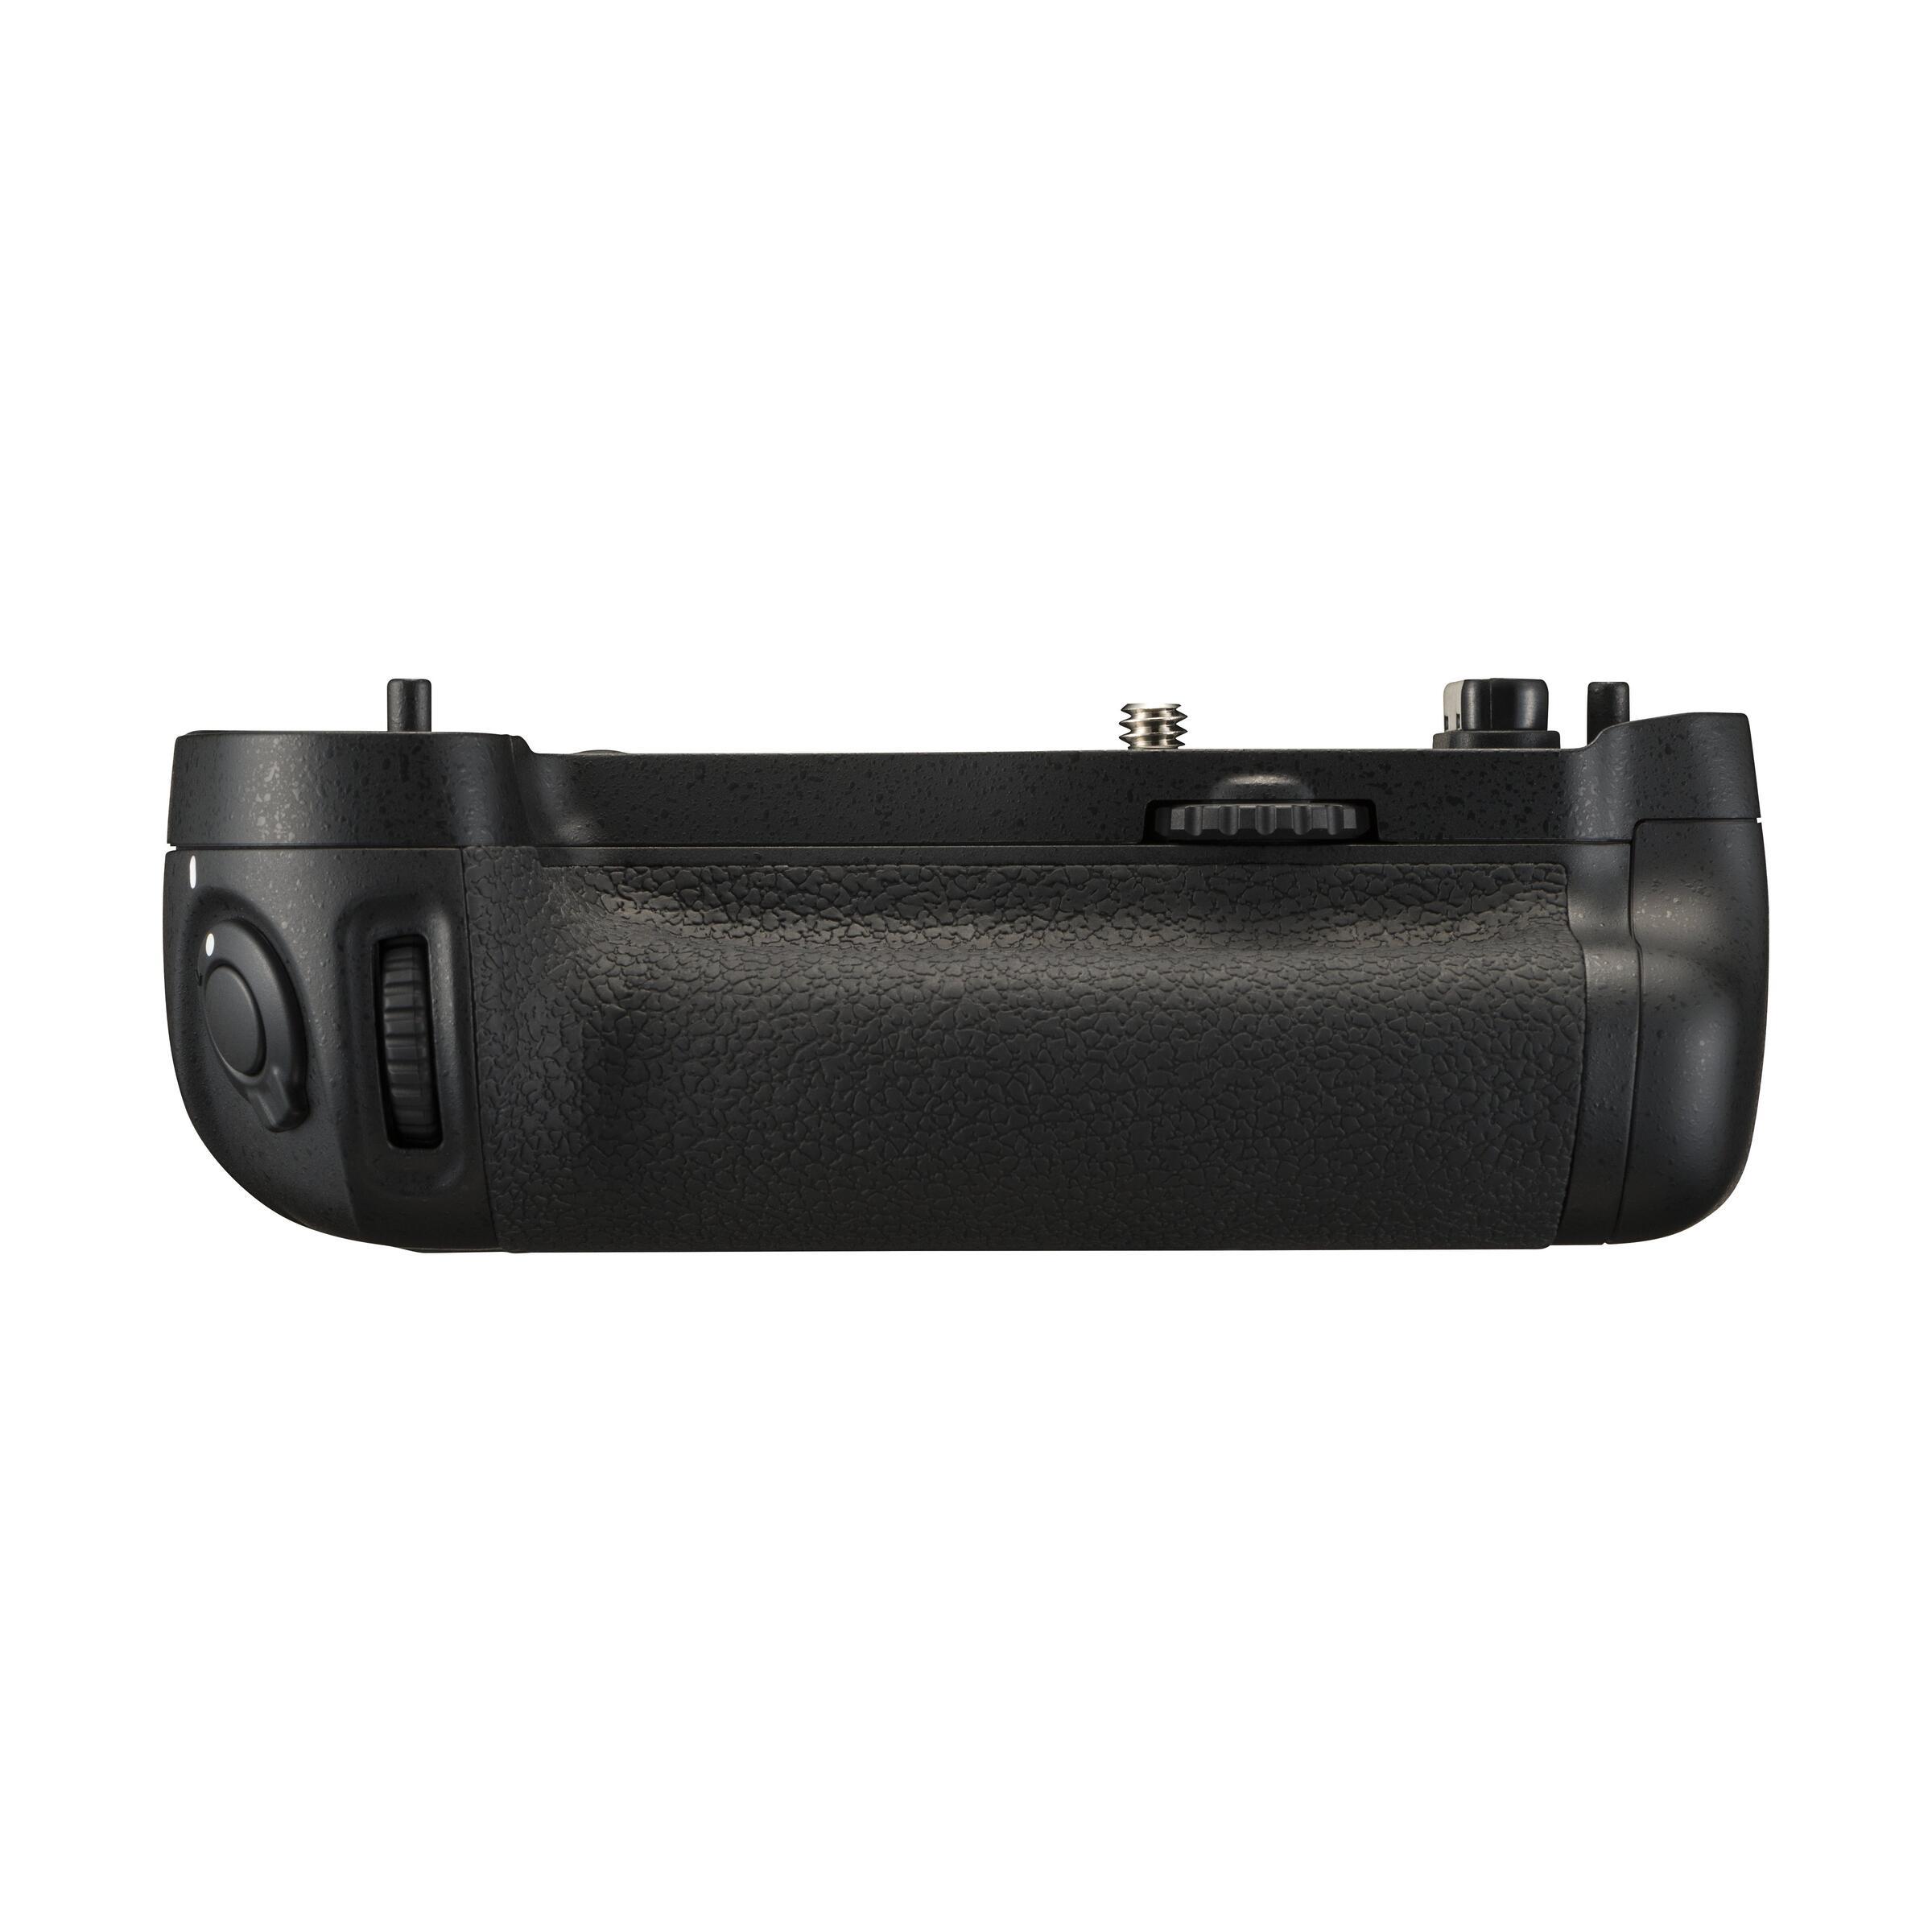 Nikon MB-D16